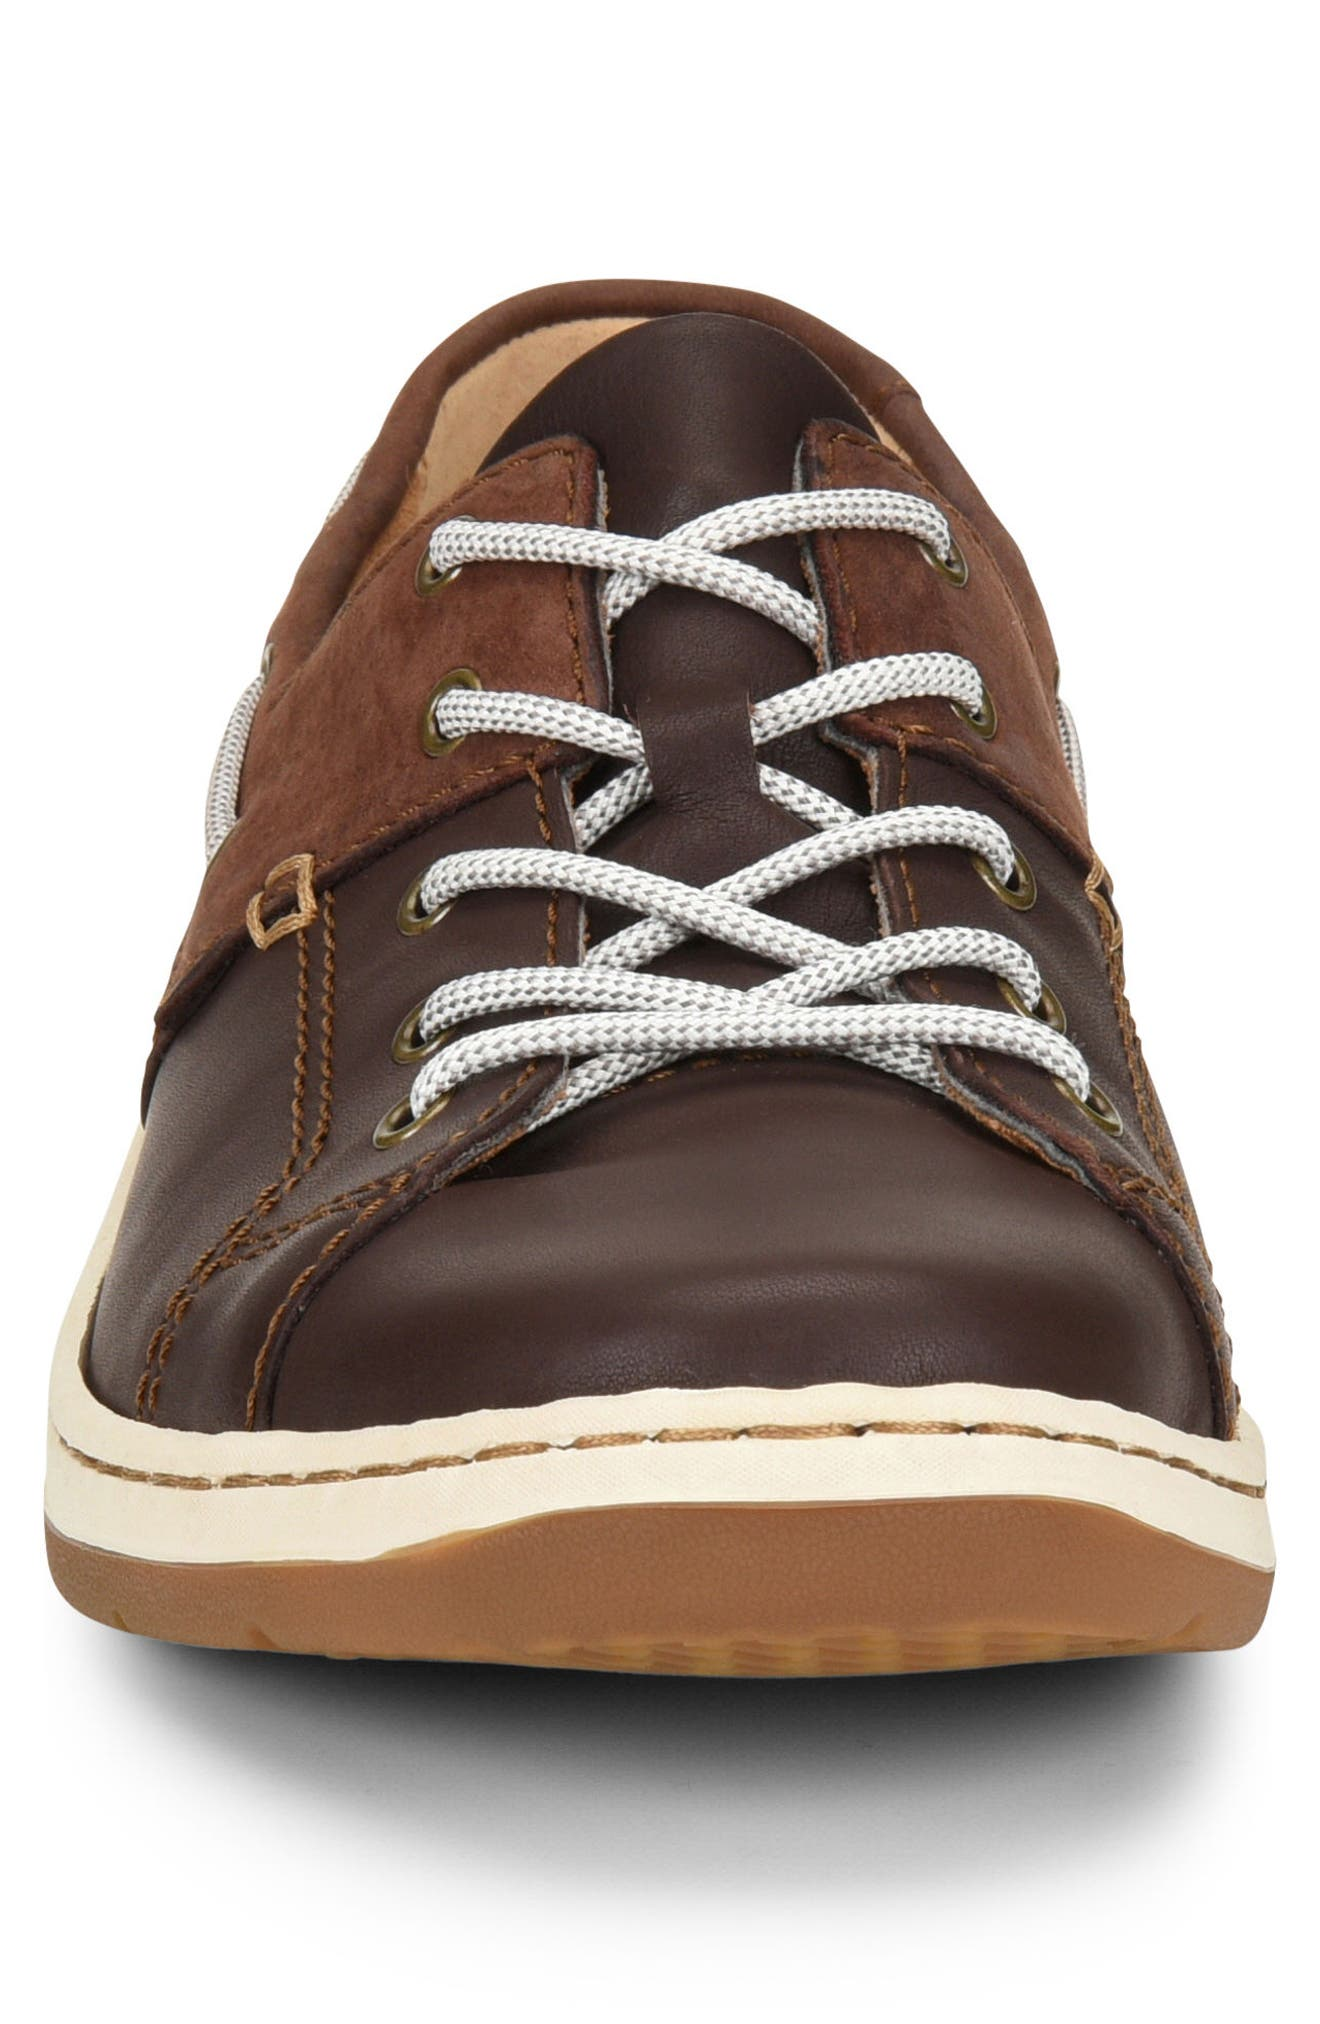 Marius Boat Shoe Sneaker,                             Alternate thumbnail 4, color,                             205